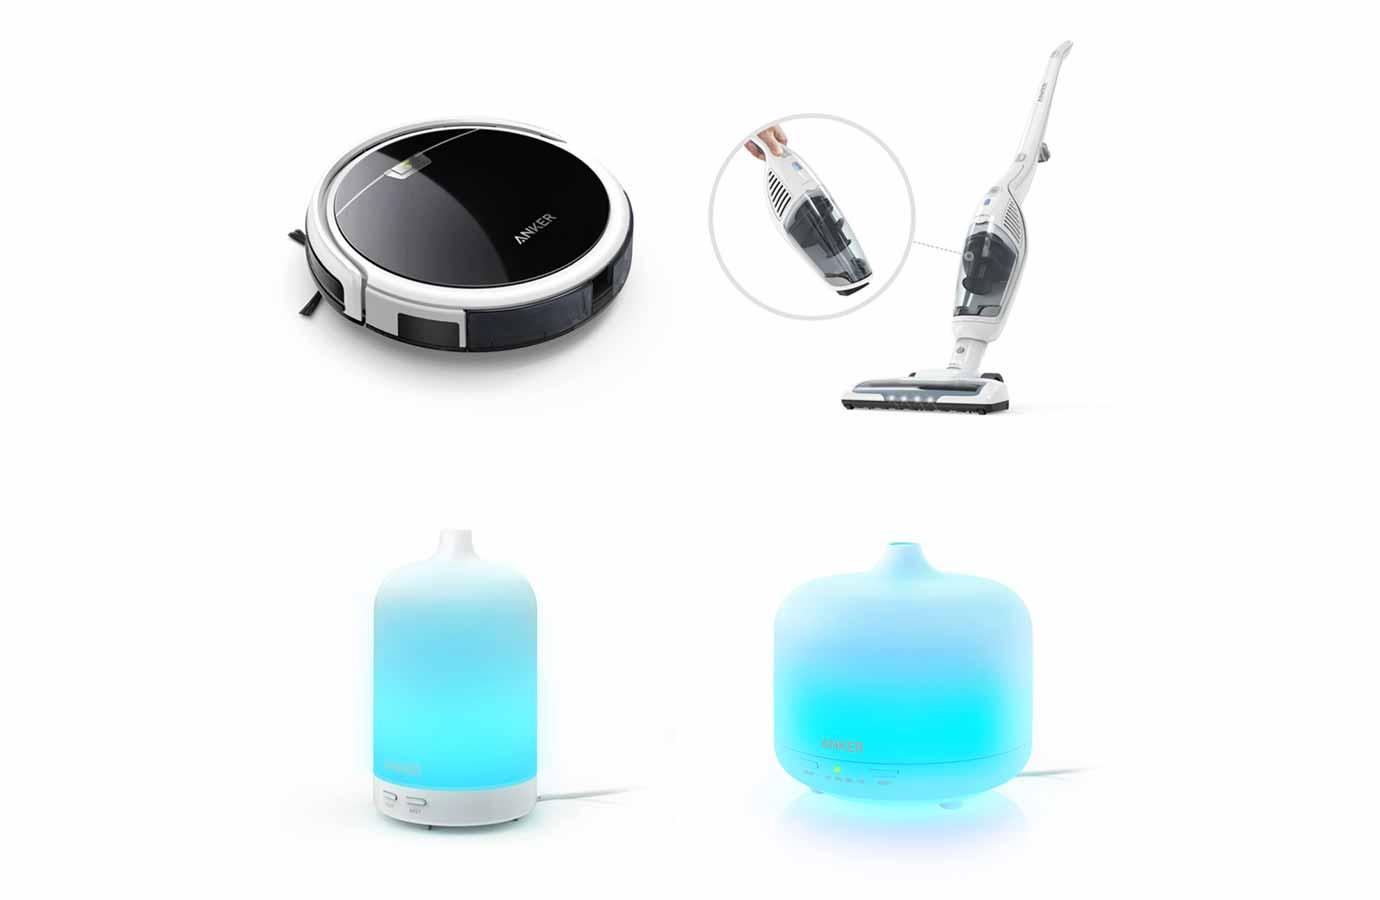 Anker、家電事業への参入を発表 – 自動掃除機ロボット、コードレス掃除機、オイルディフューザーを発売へ